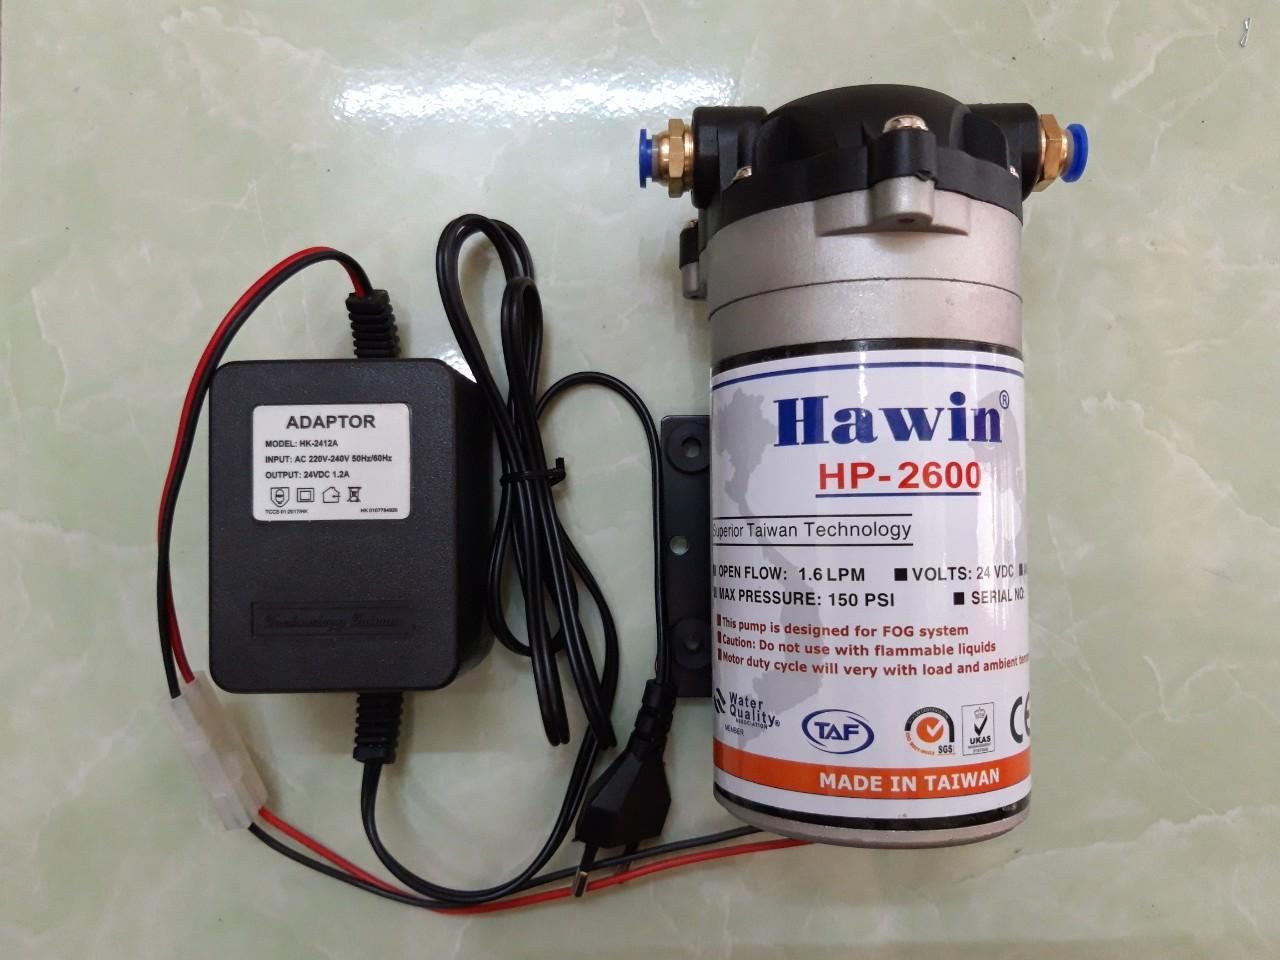 Máy phun sương Đài Loan Hawin HP-2600 (phun được 15-25 béc)